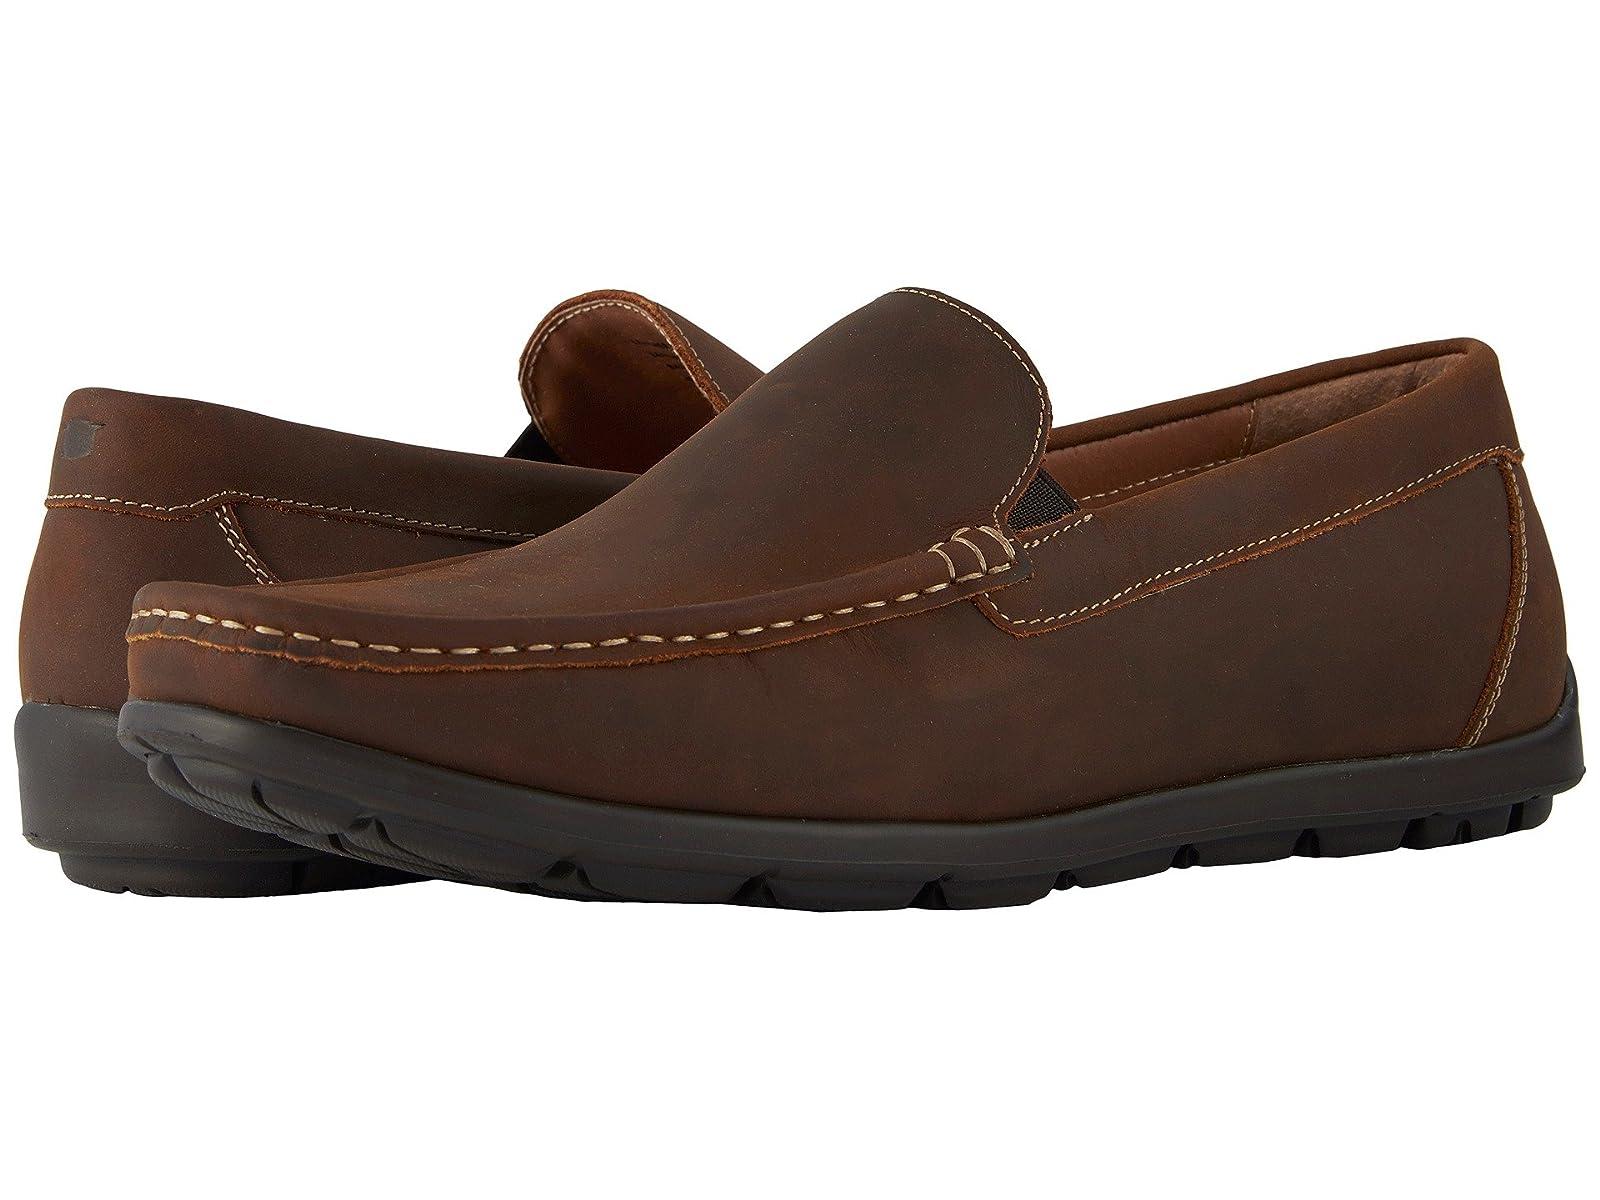 Florsheim Draft Moc Toe Venetian DriverAtmospheric grades have affordable shoes